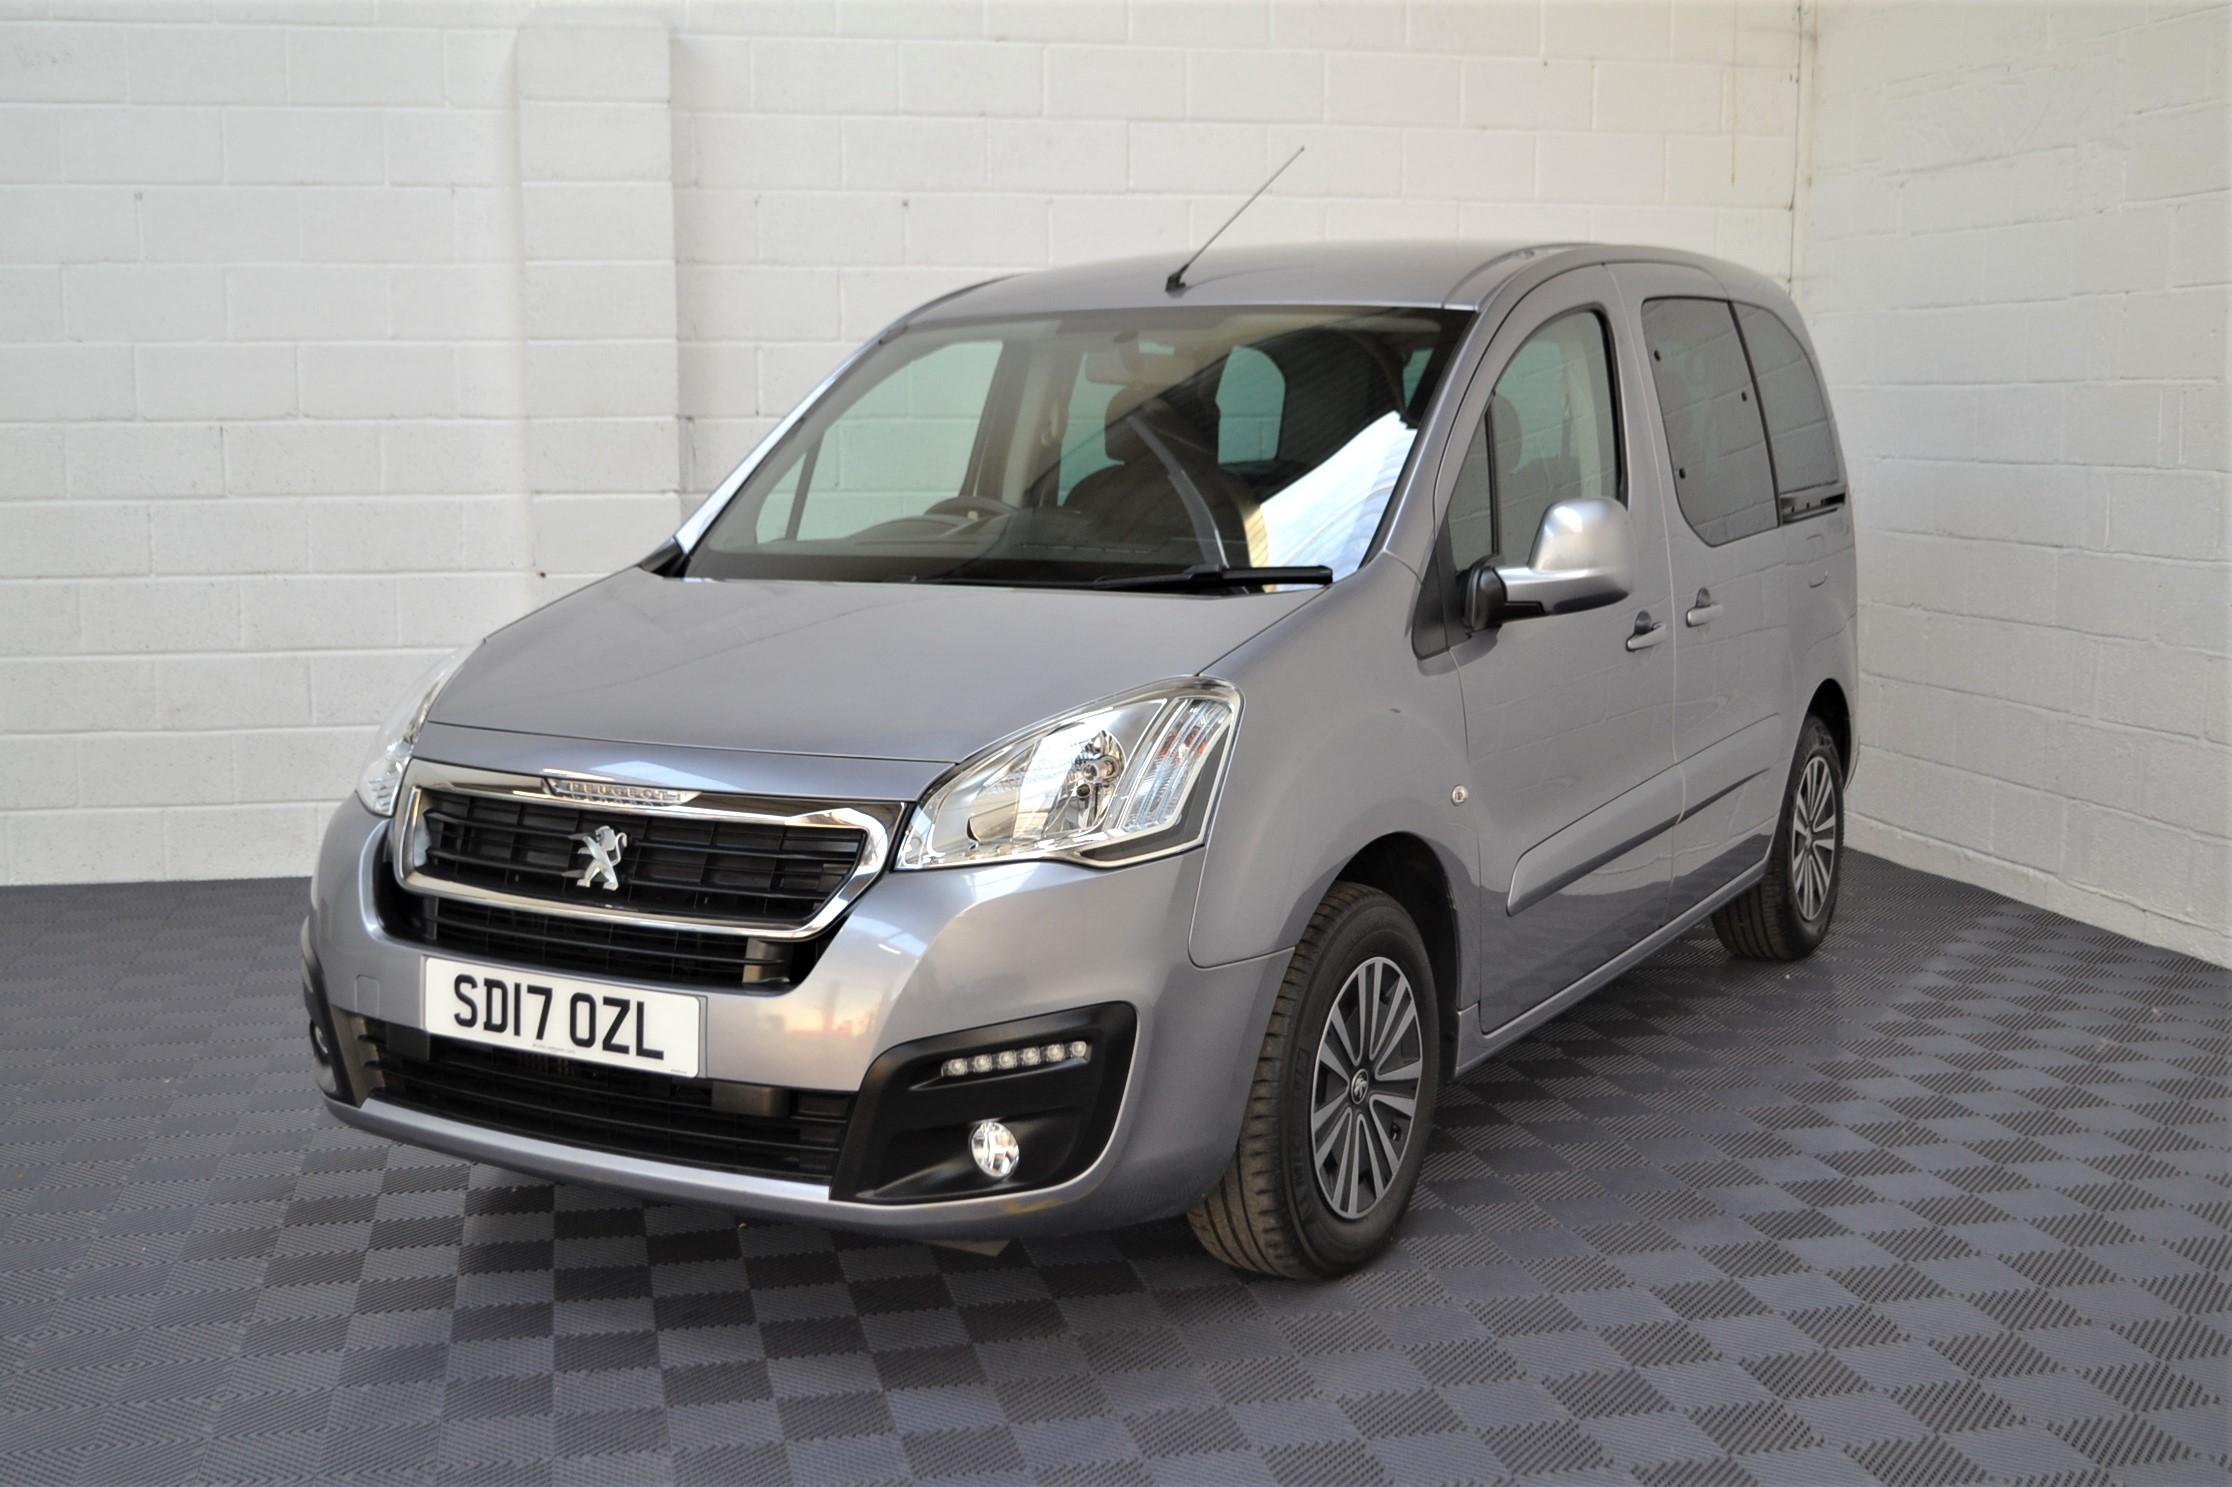 WAV Cars For Sale Bristol Wheelchair Accessible Vehicles Used For Sale Somerset Devon Dorset Bath Peugeot Partner SD17 OZL 21